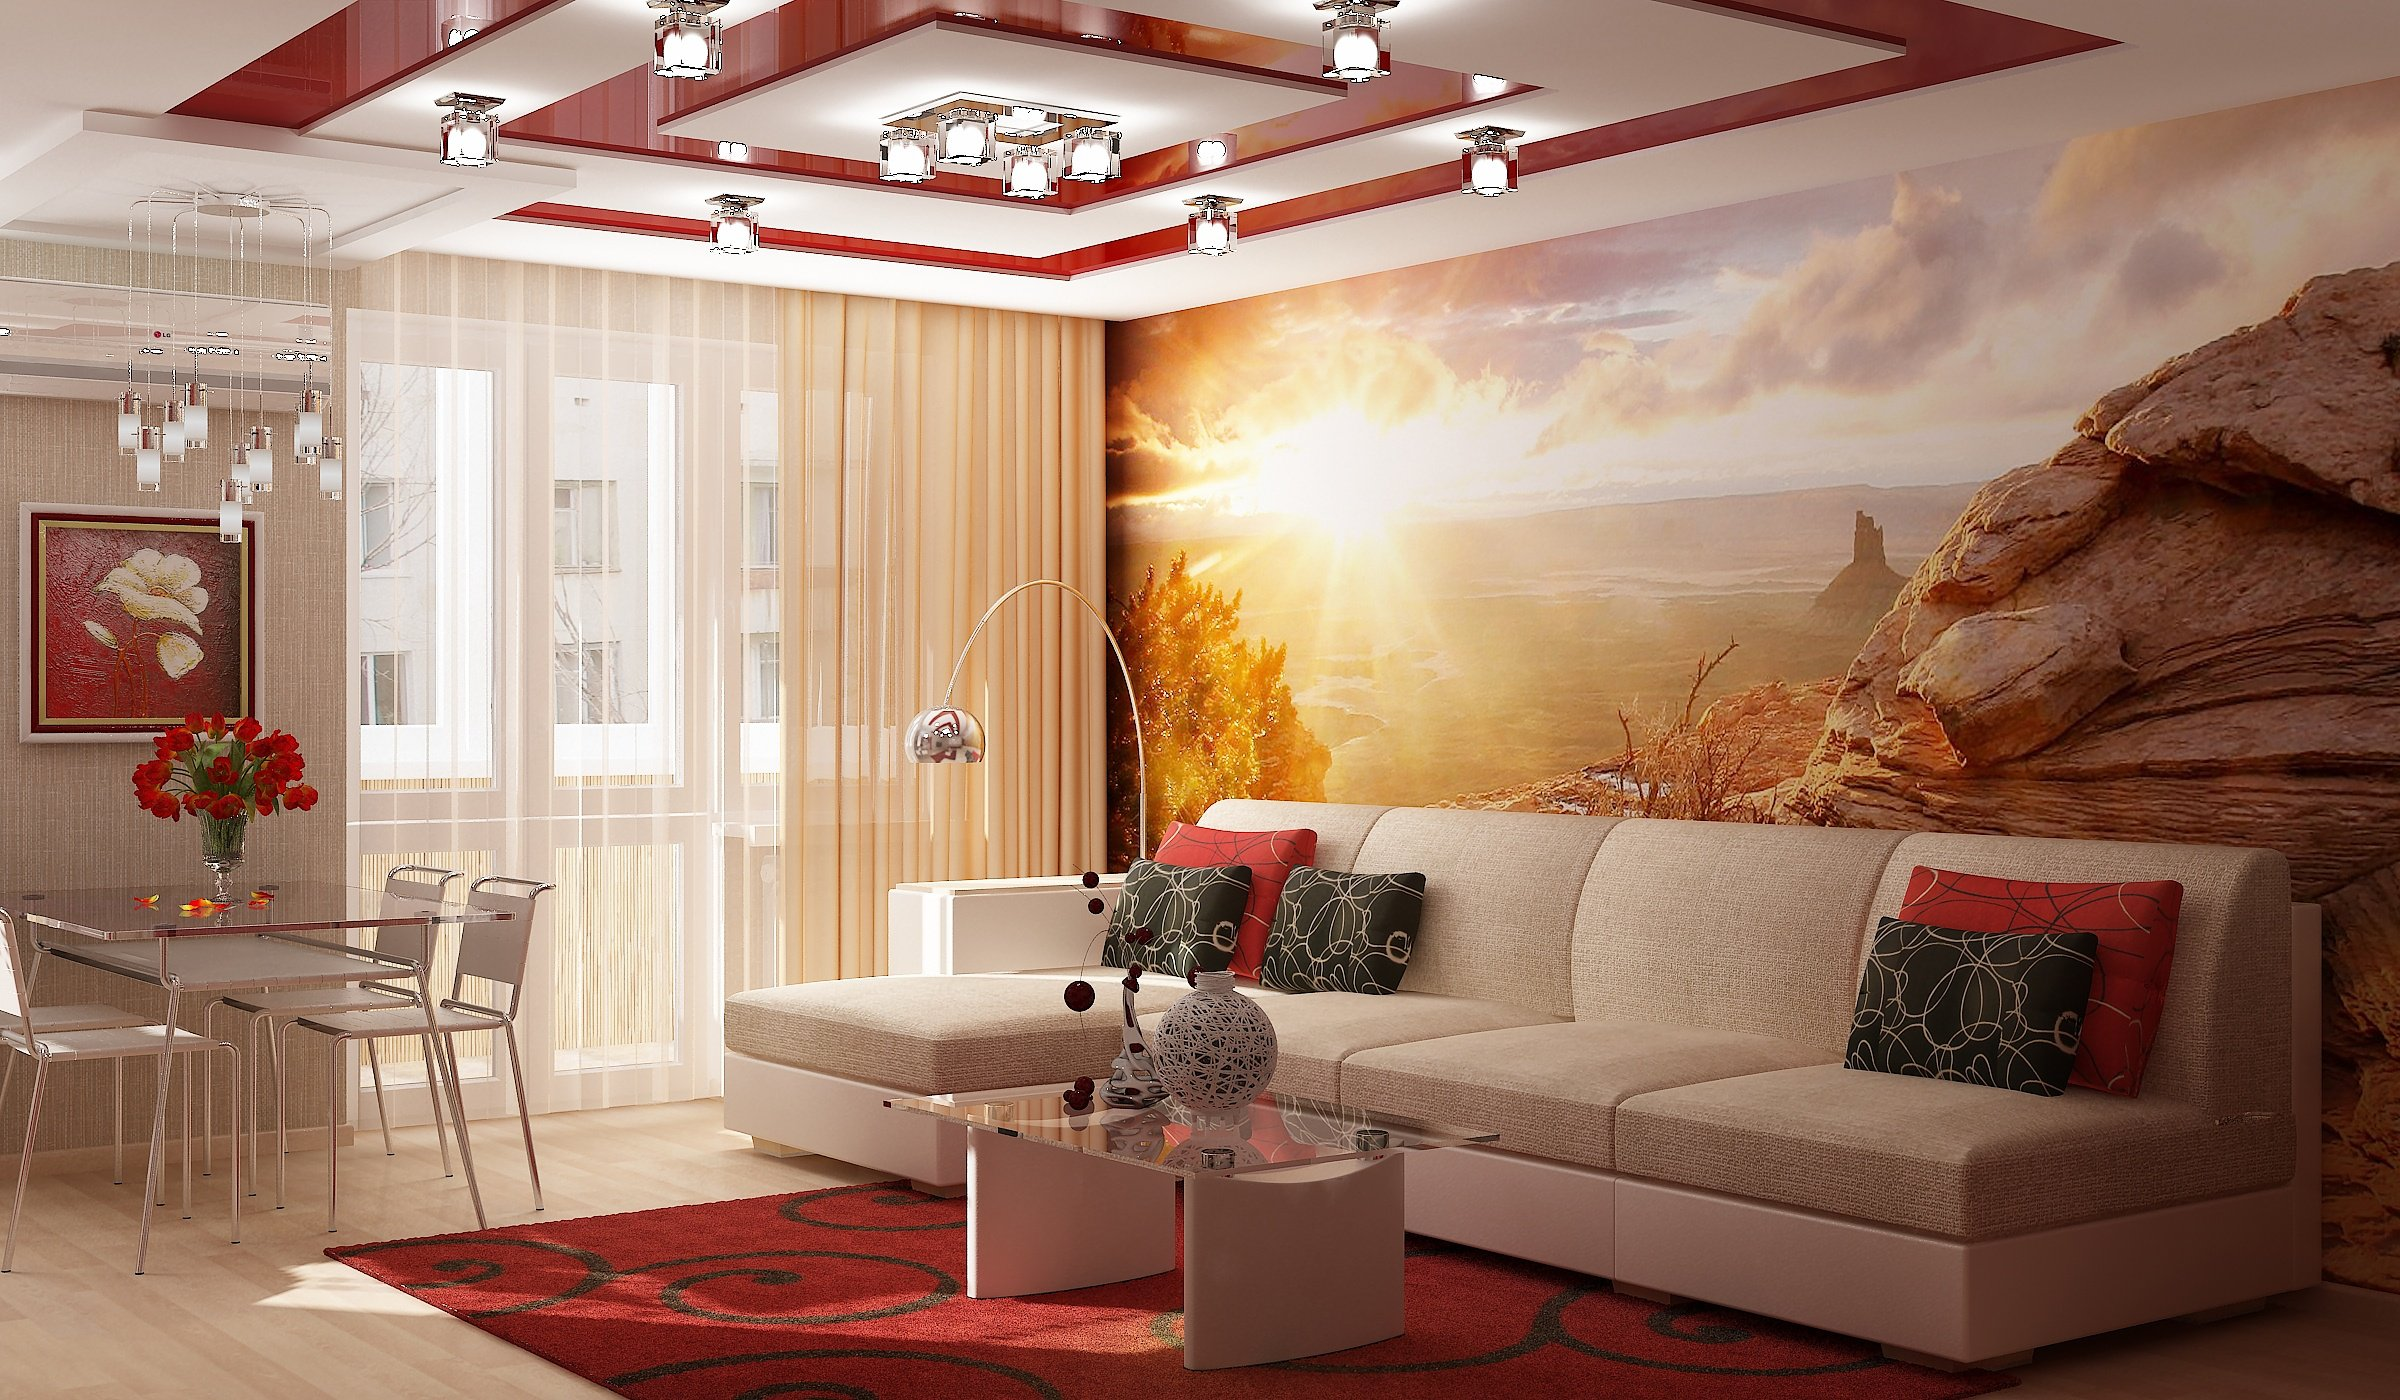 Ремонты и дизайны квартир